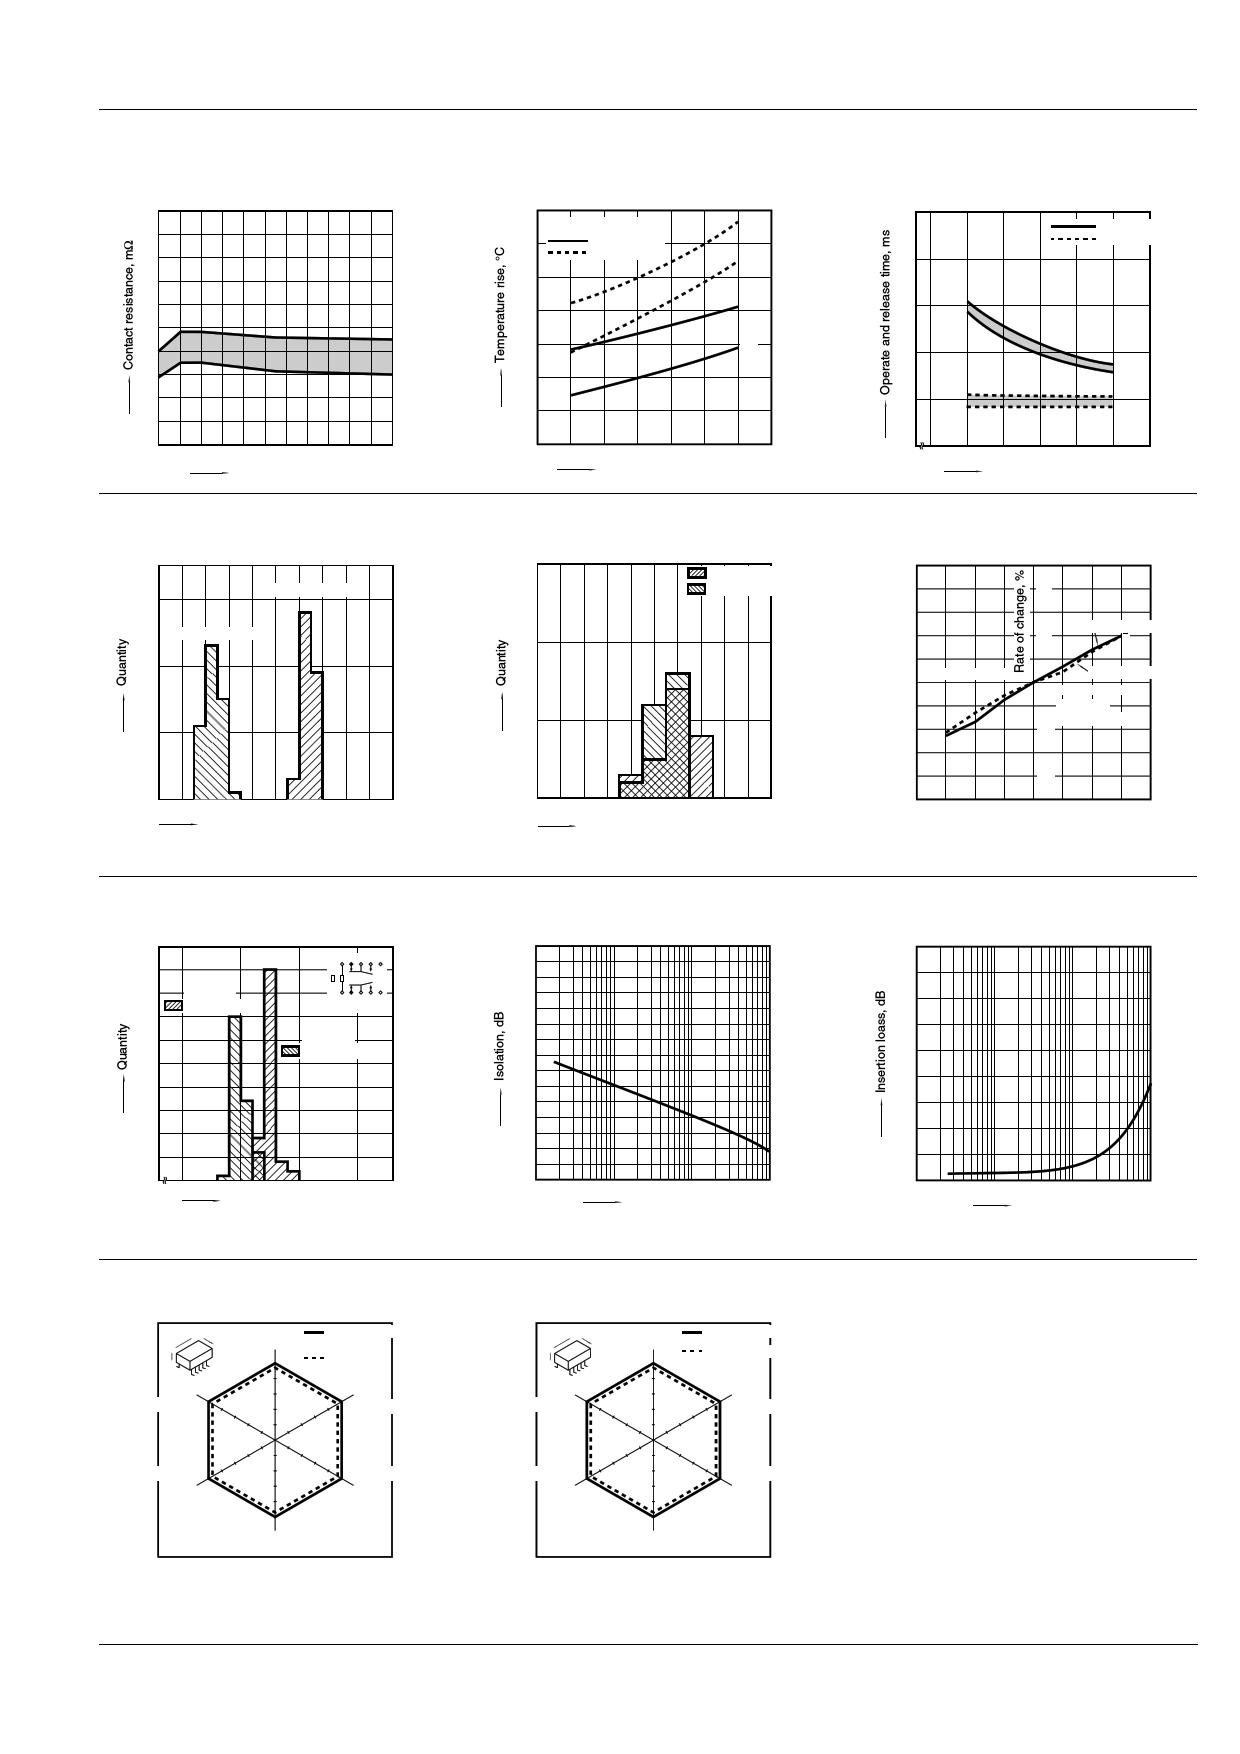 TQ2SL-L2-24V pdf, 반도체, 판매, 대치품